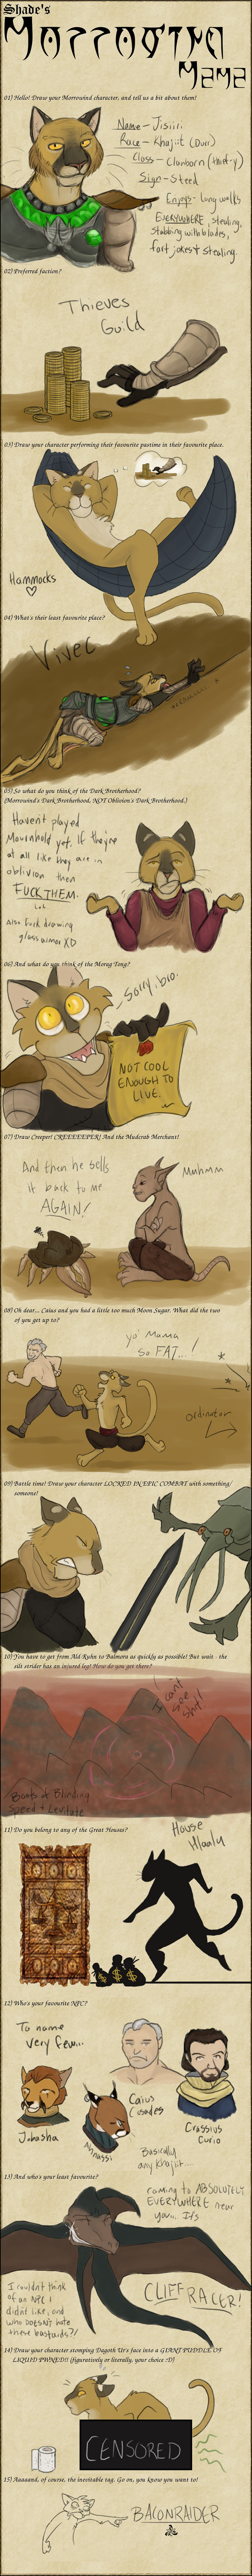 Morrowind Meme by kitendawili